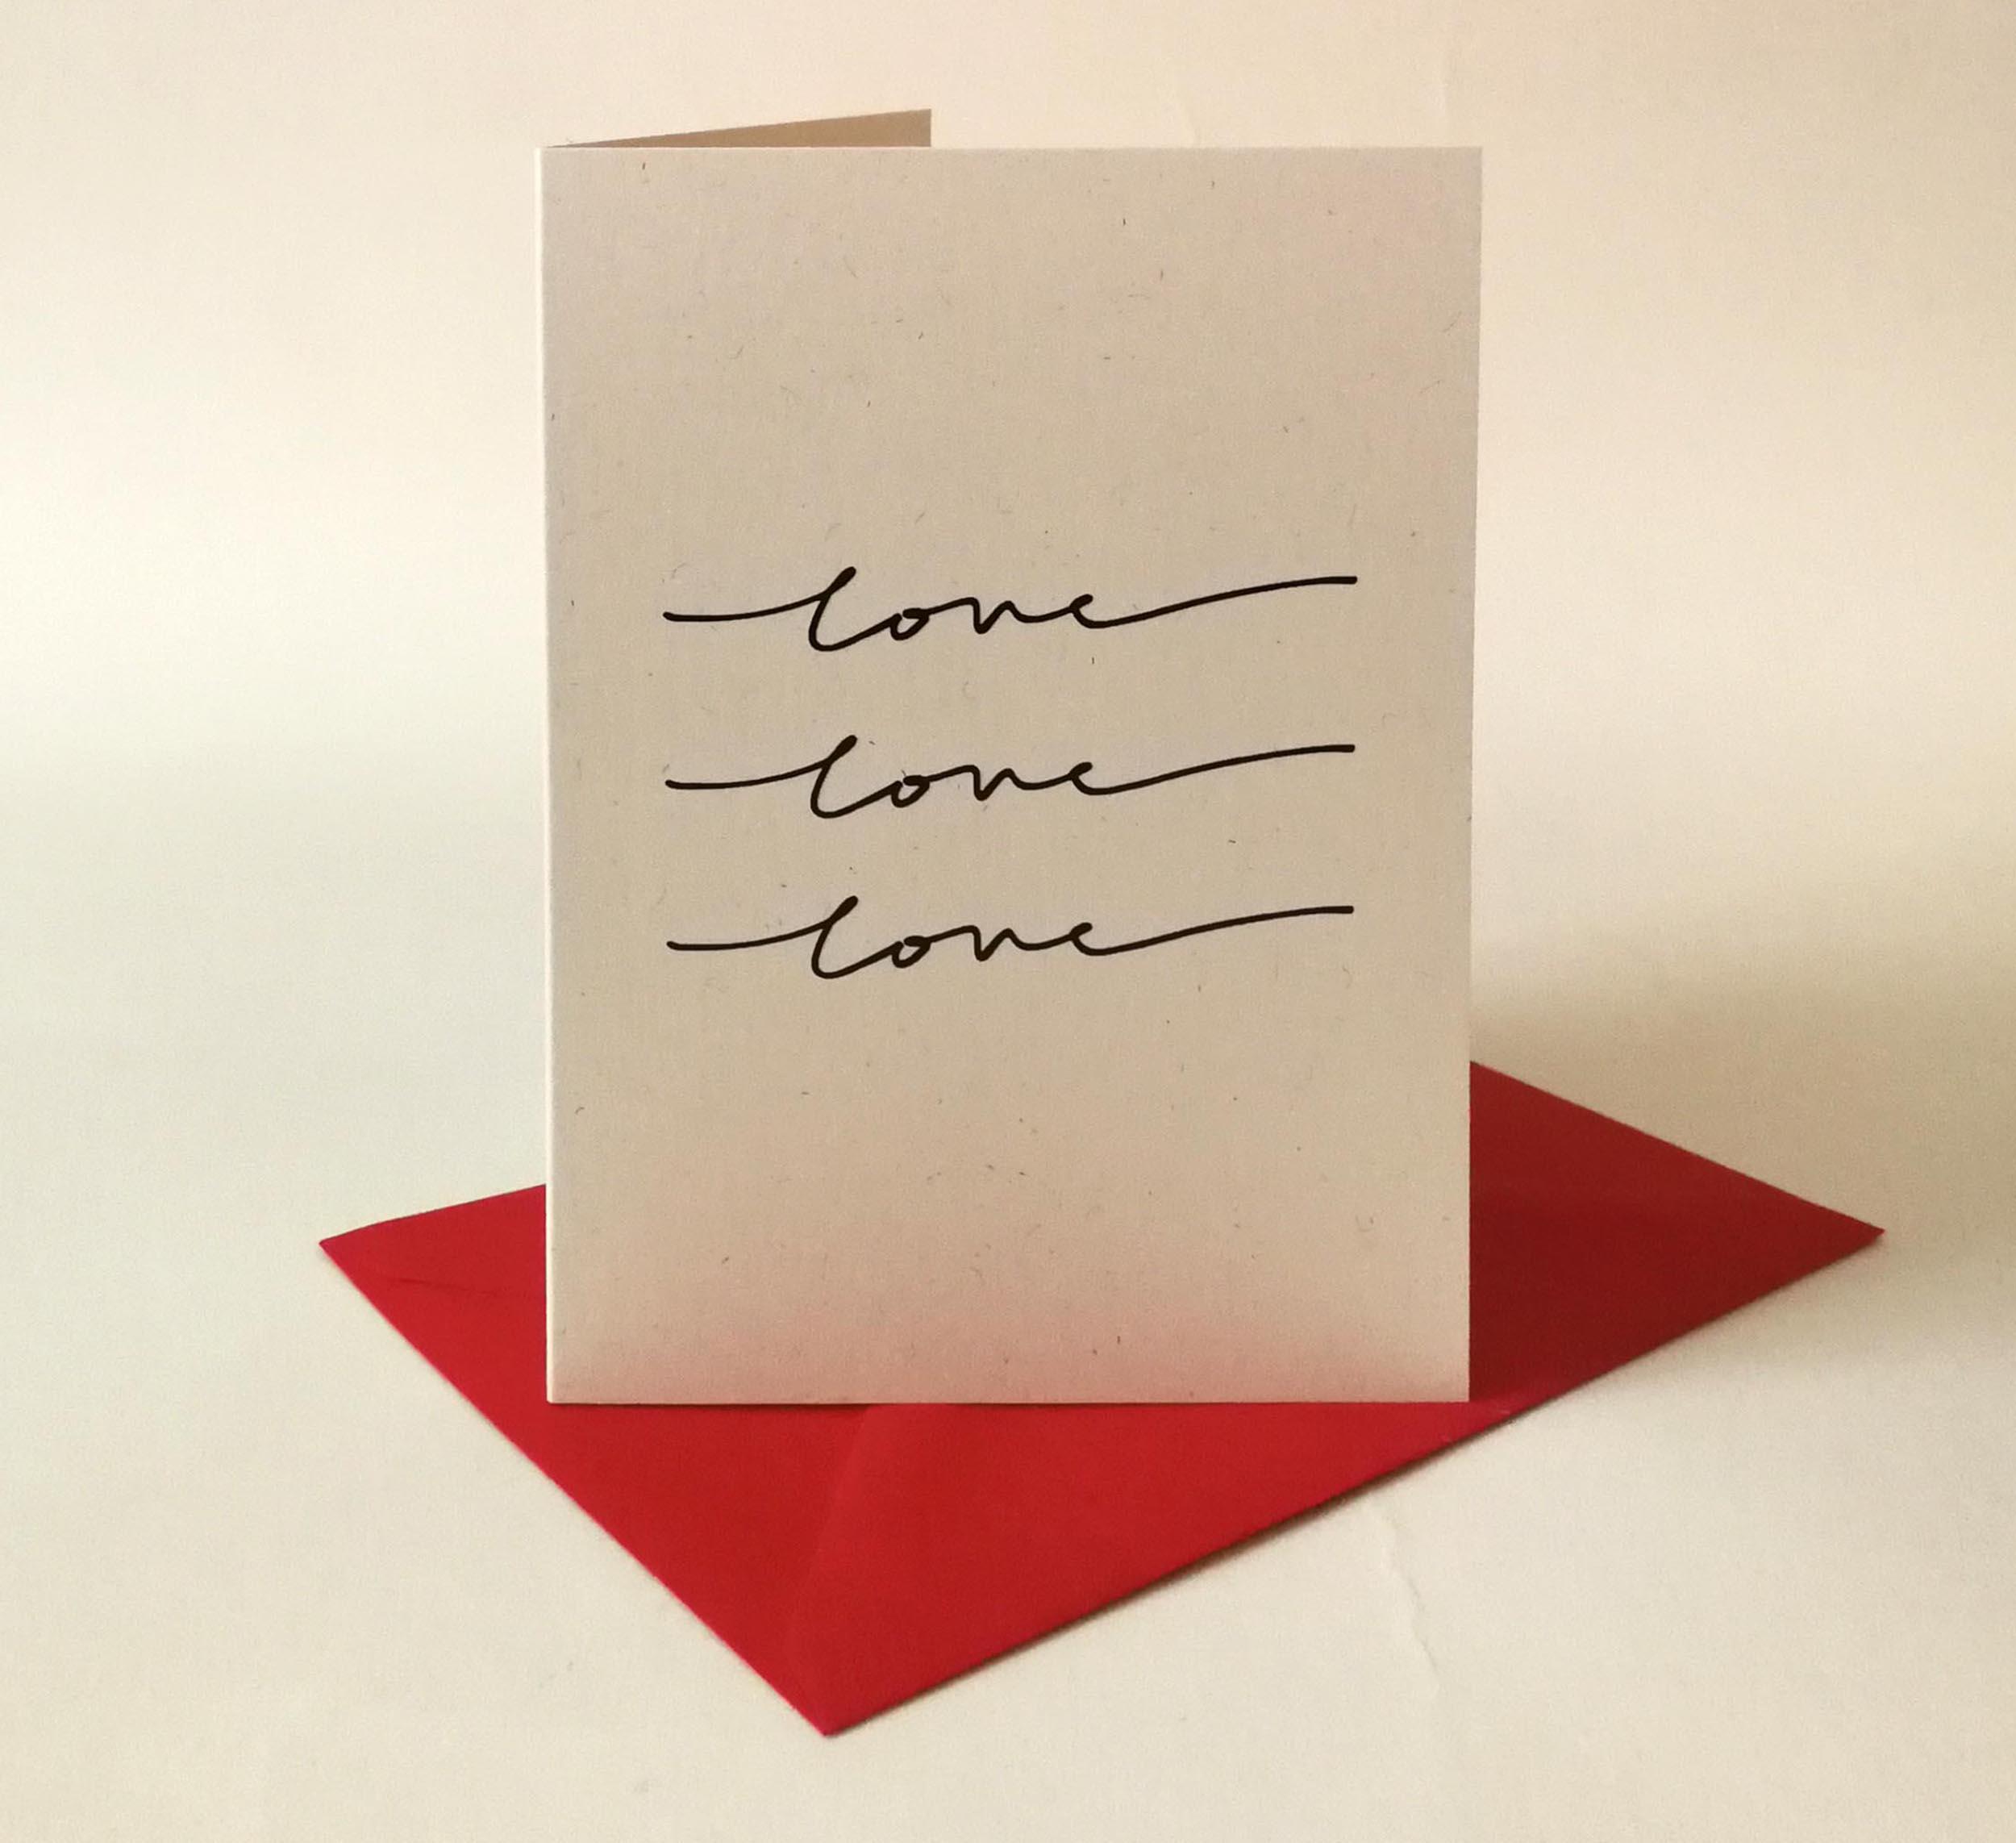 lovelovelove-card-edit-2500px-web.jpg